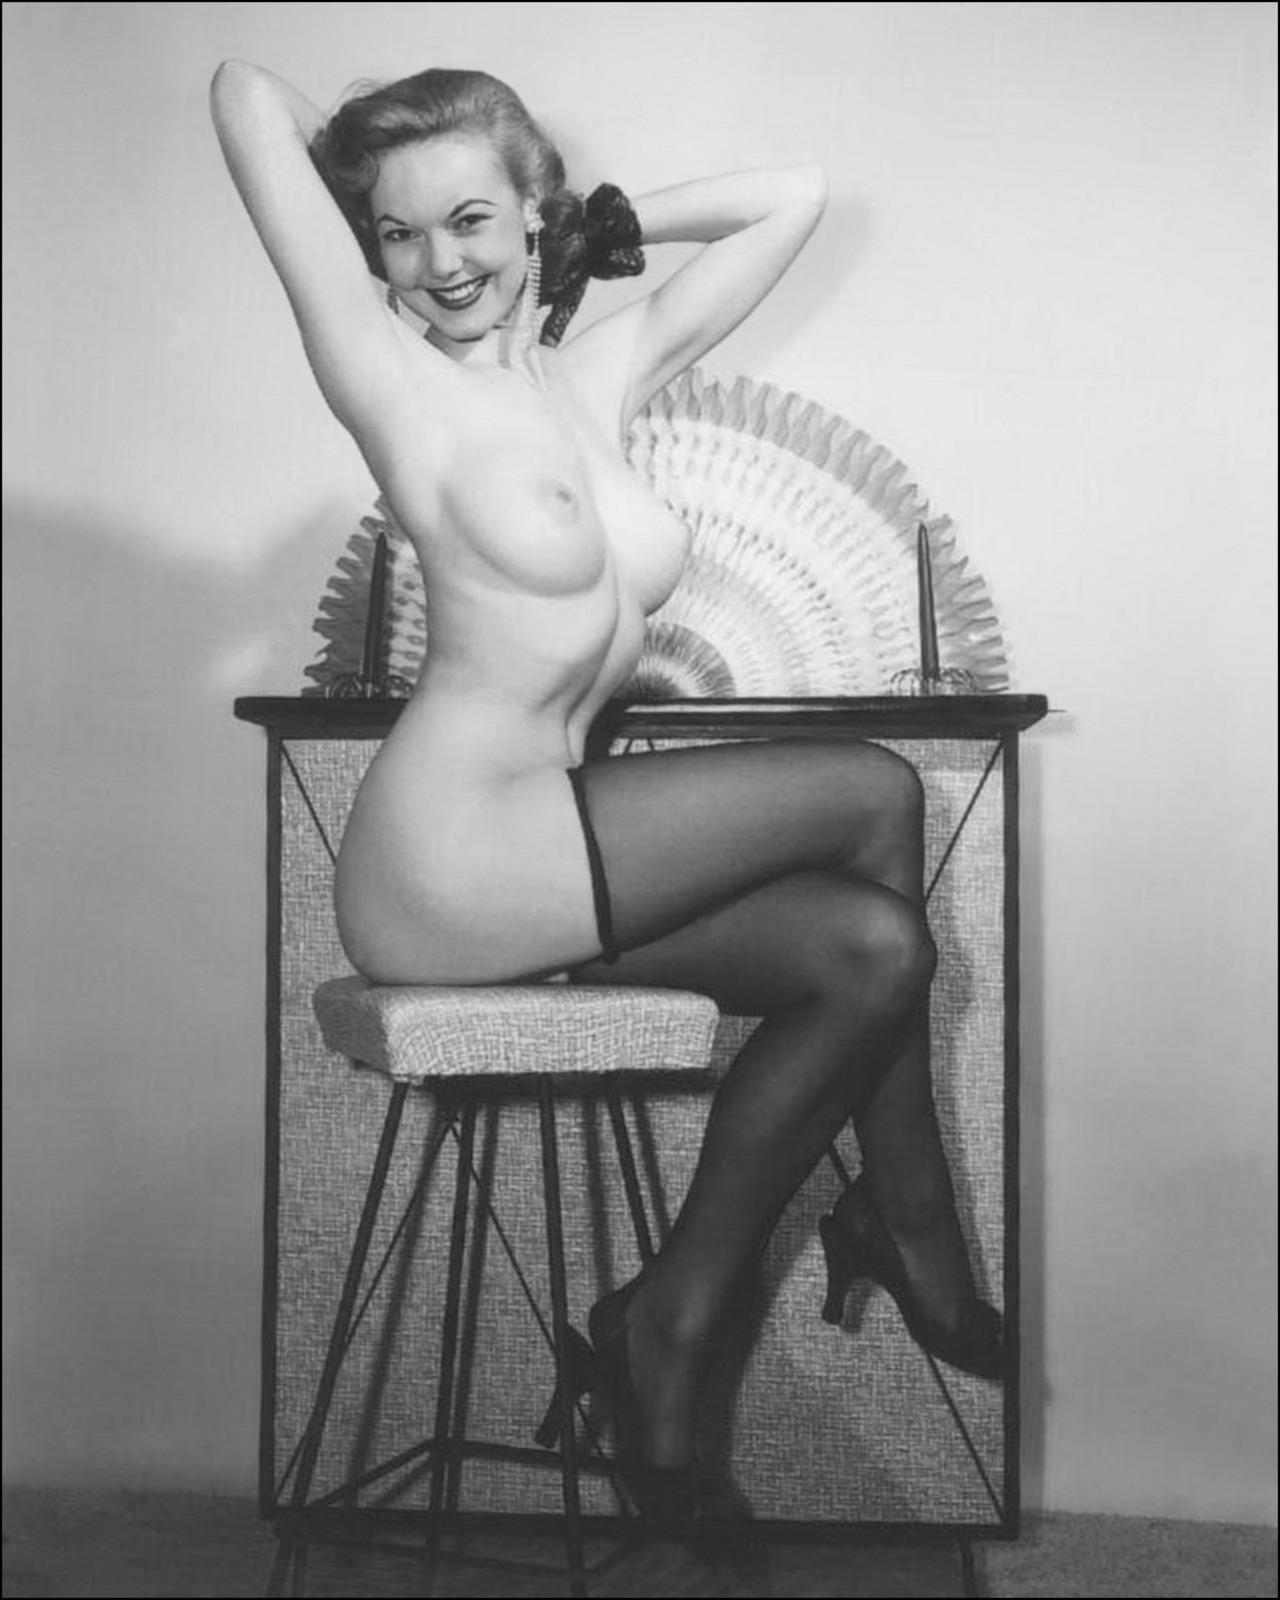 Ретро порно фото 30 х годов 1 фотография